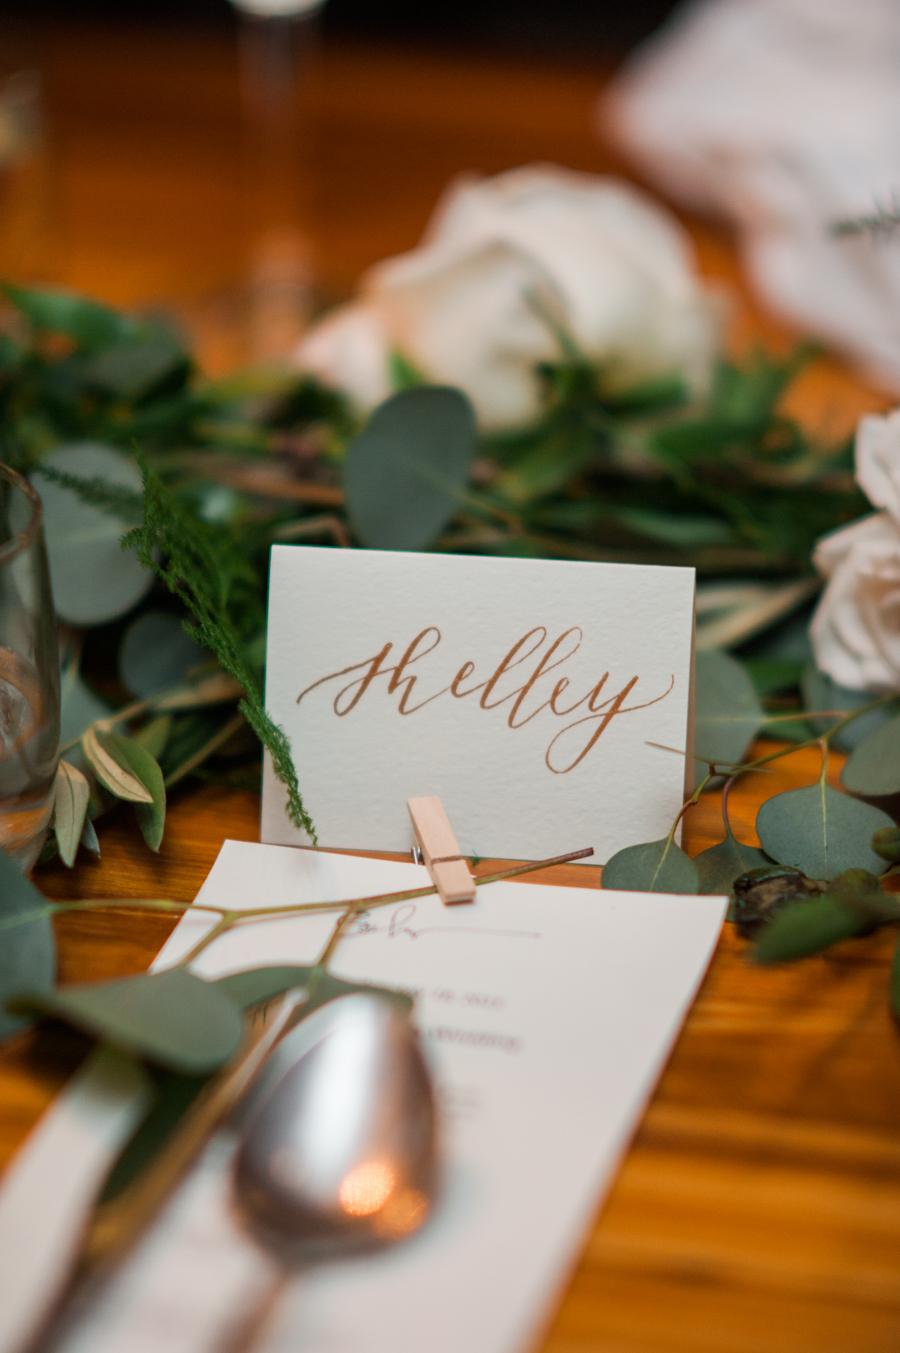 Big Love Wedding Design, Toronto Wedding, Boehmer, copper calligraphy place cards